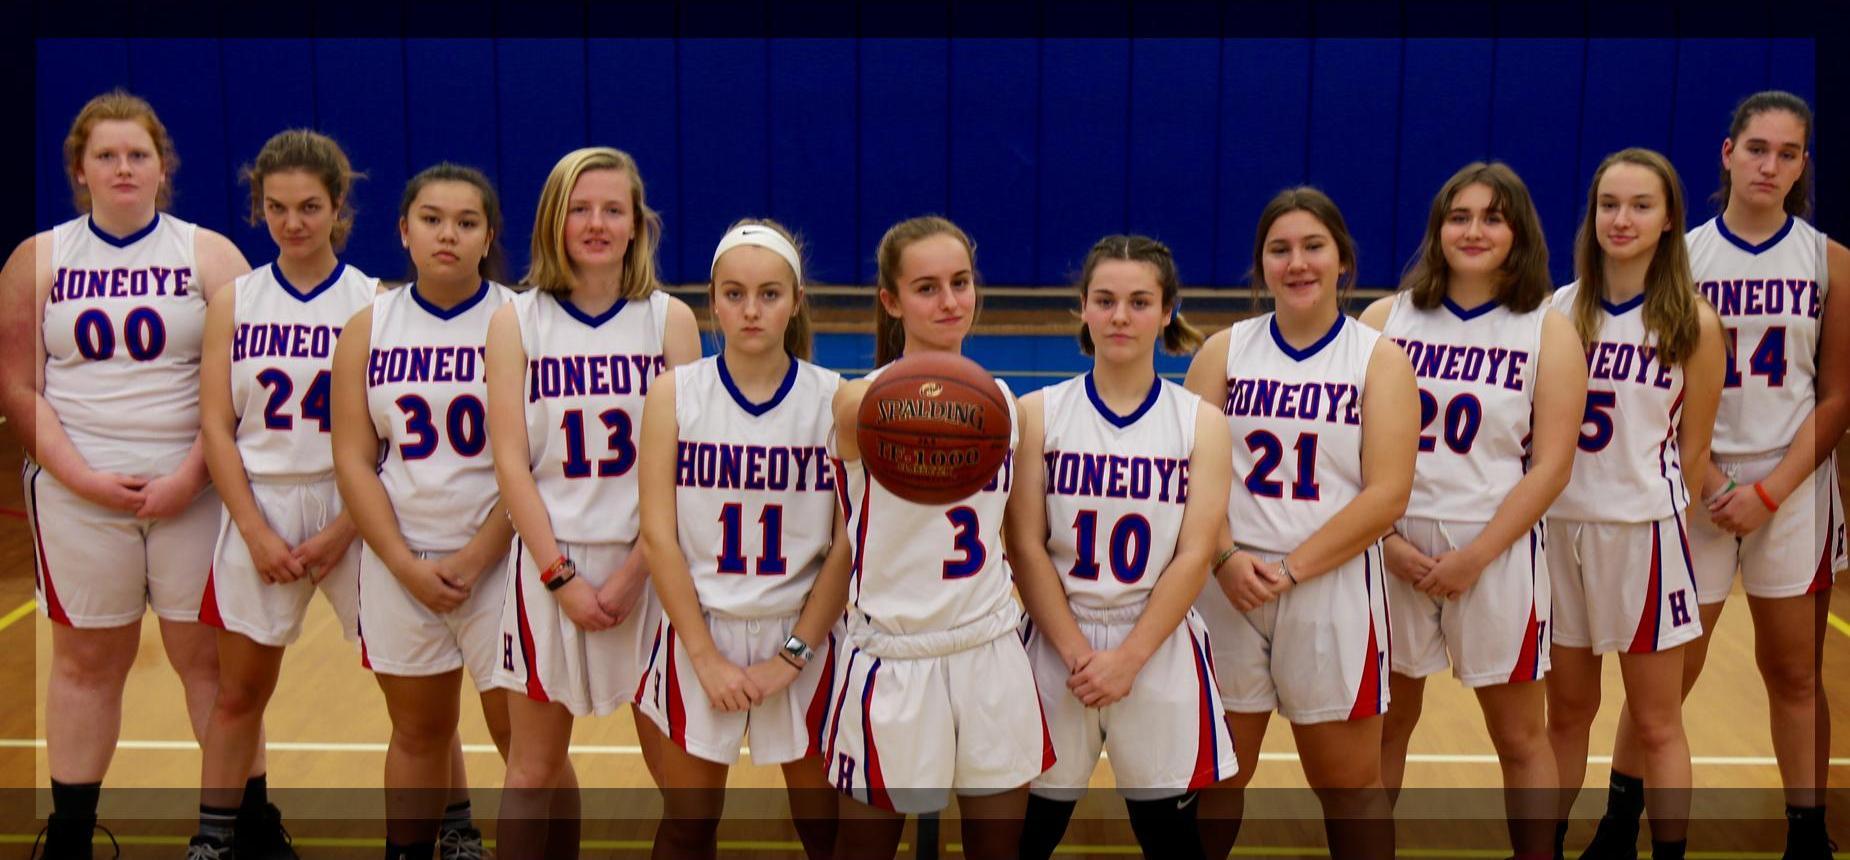 Girls High School Basketball team.